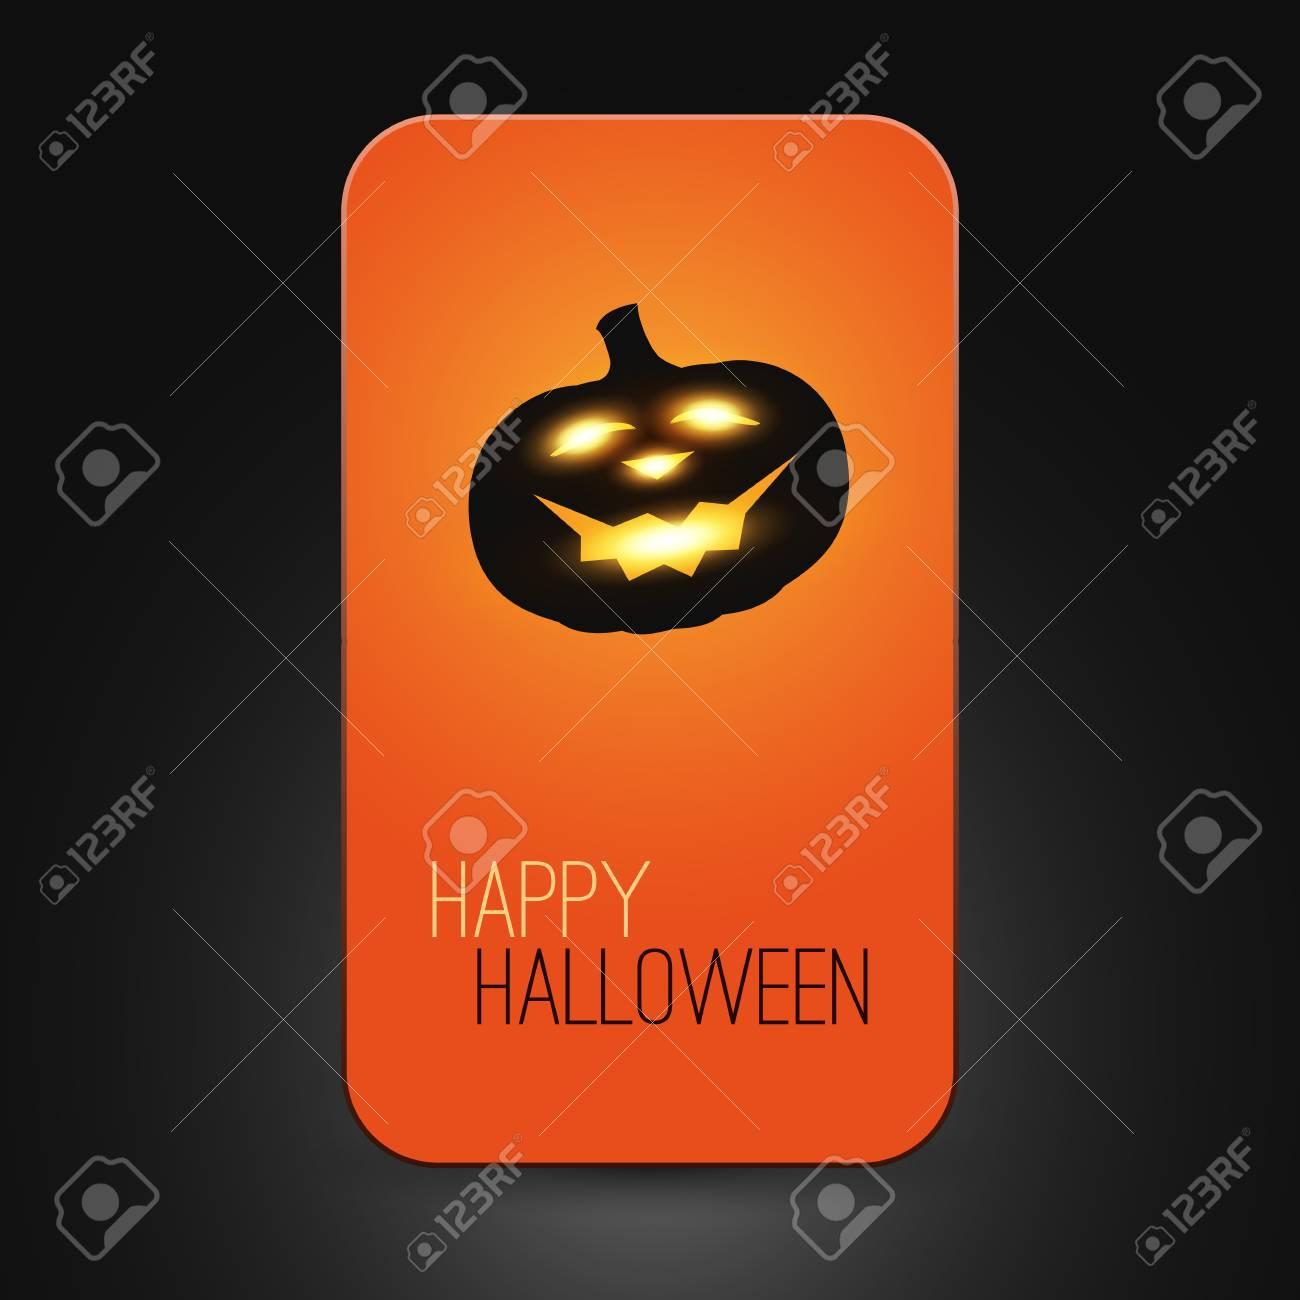 Halloween Card Stock Vector - 22846278